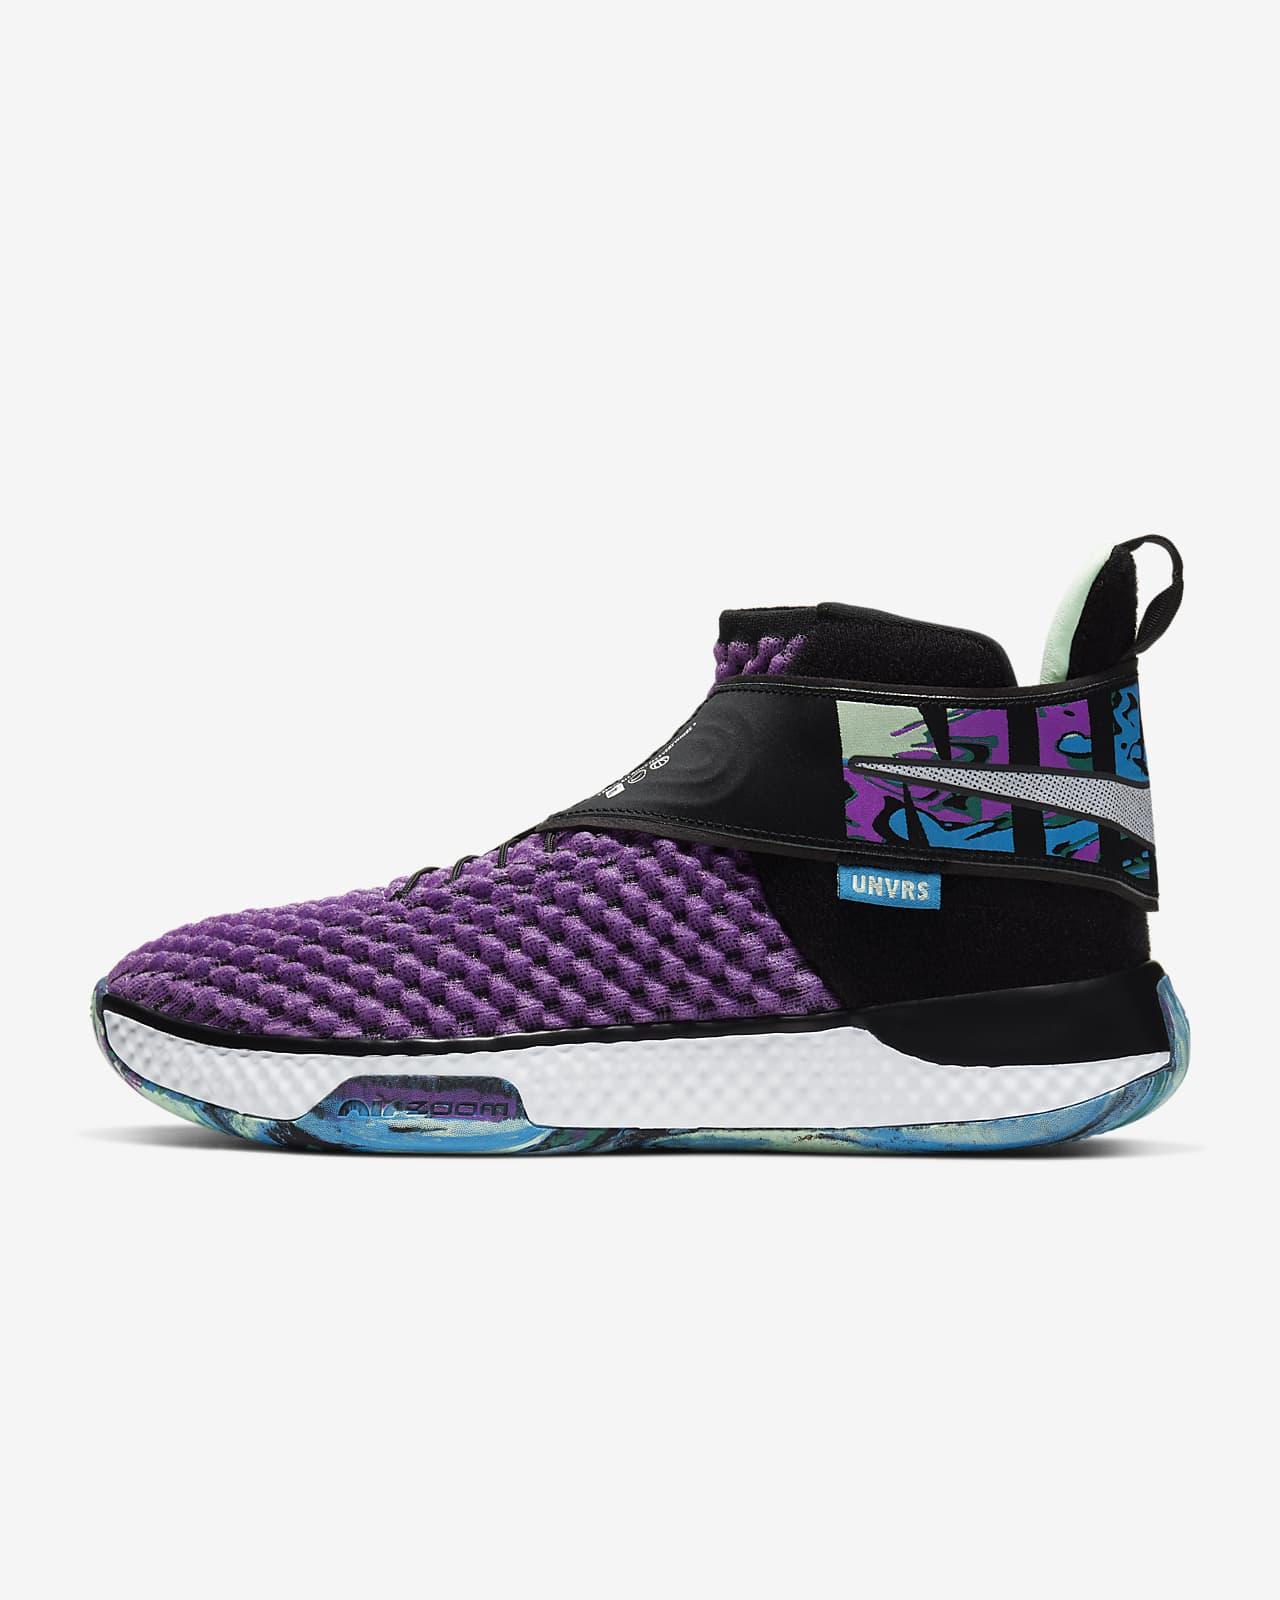 Nike Air Zoom UNVRS 男/女子篮球鞋